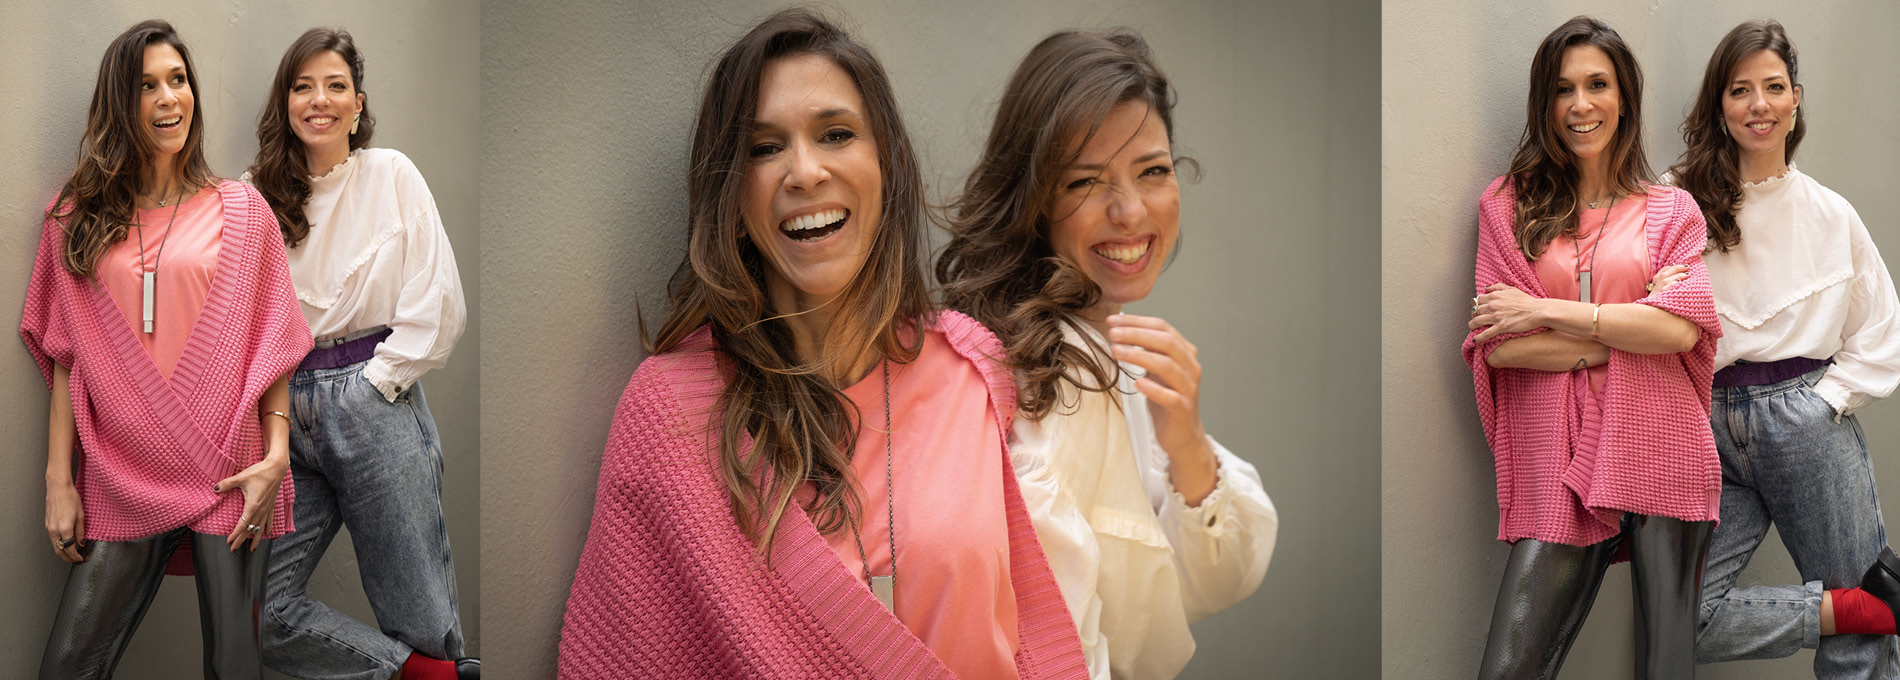 Sarah Oliveira e Roberta Martinelli: Música dá audiência sim